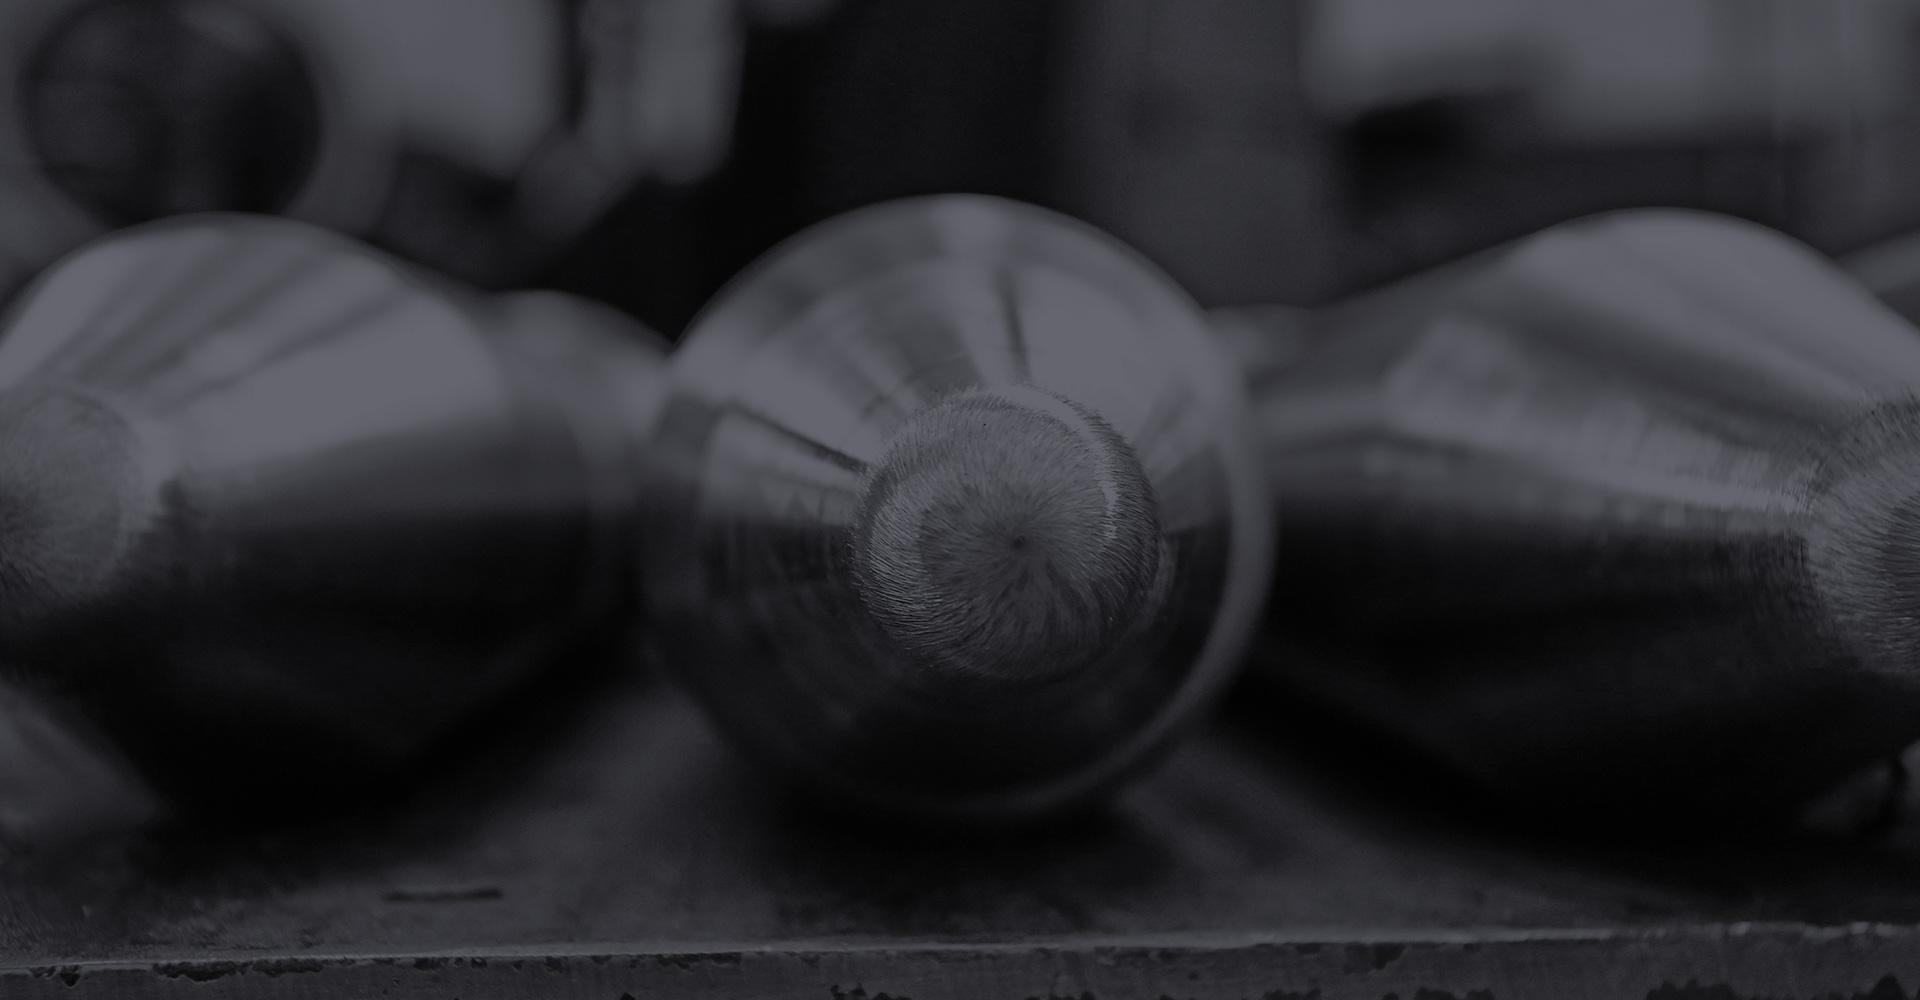 Martelli demolitori idraulici - Eusiti